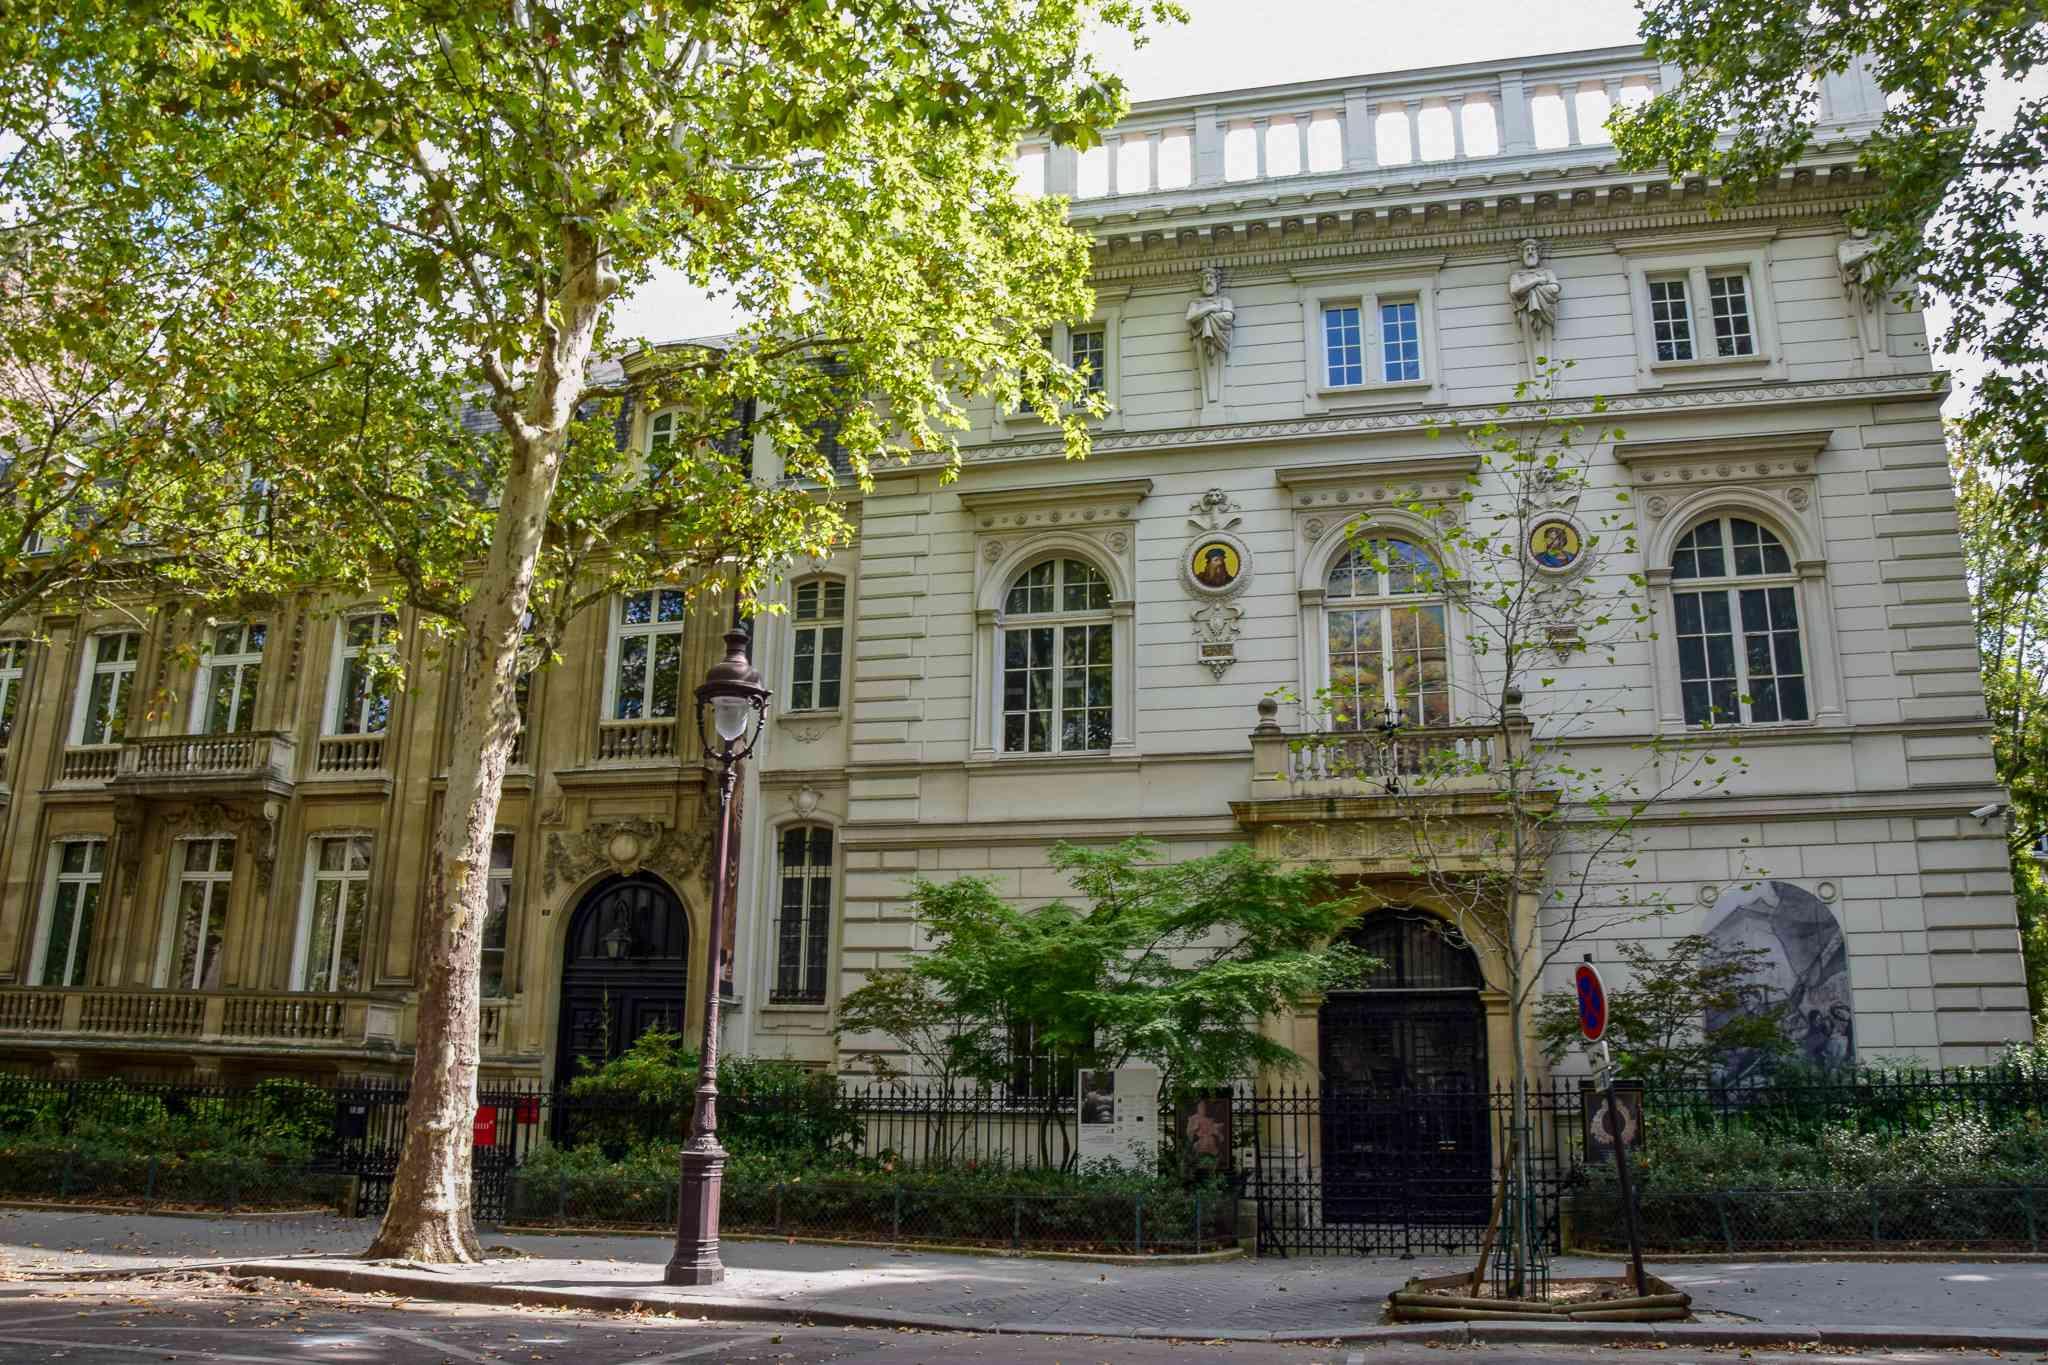 Musée Cernuschi in Paris, France